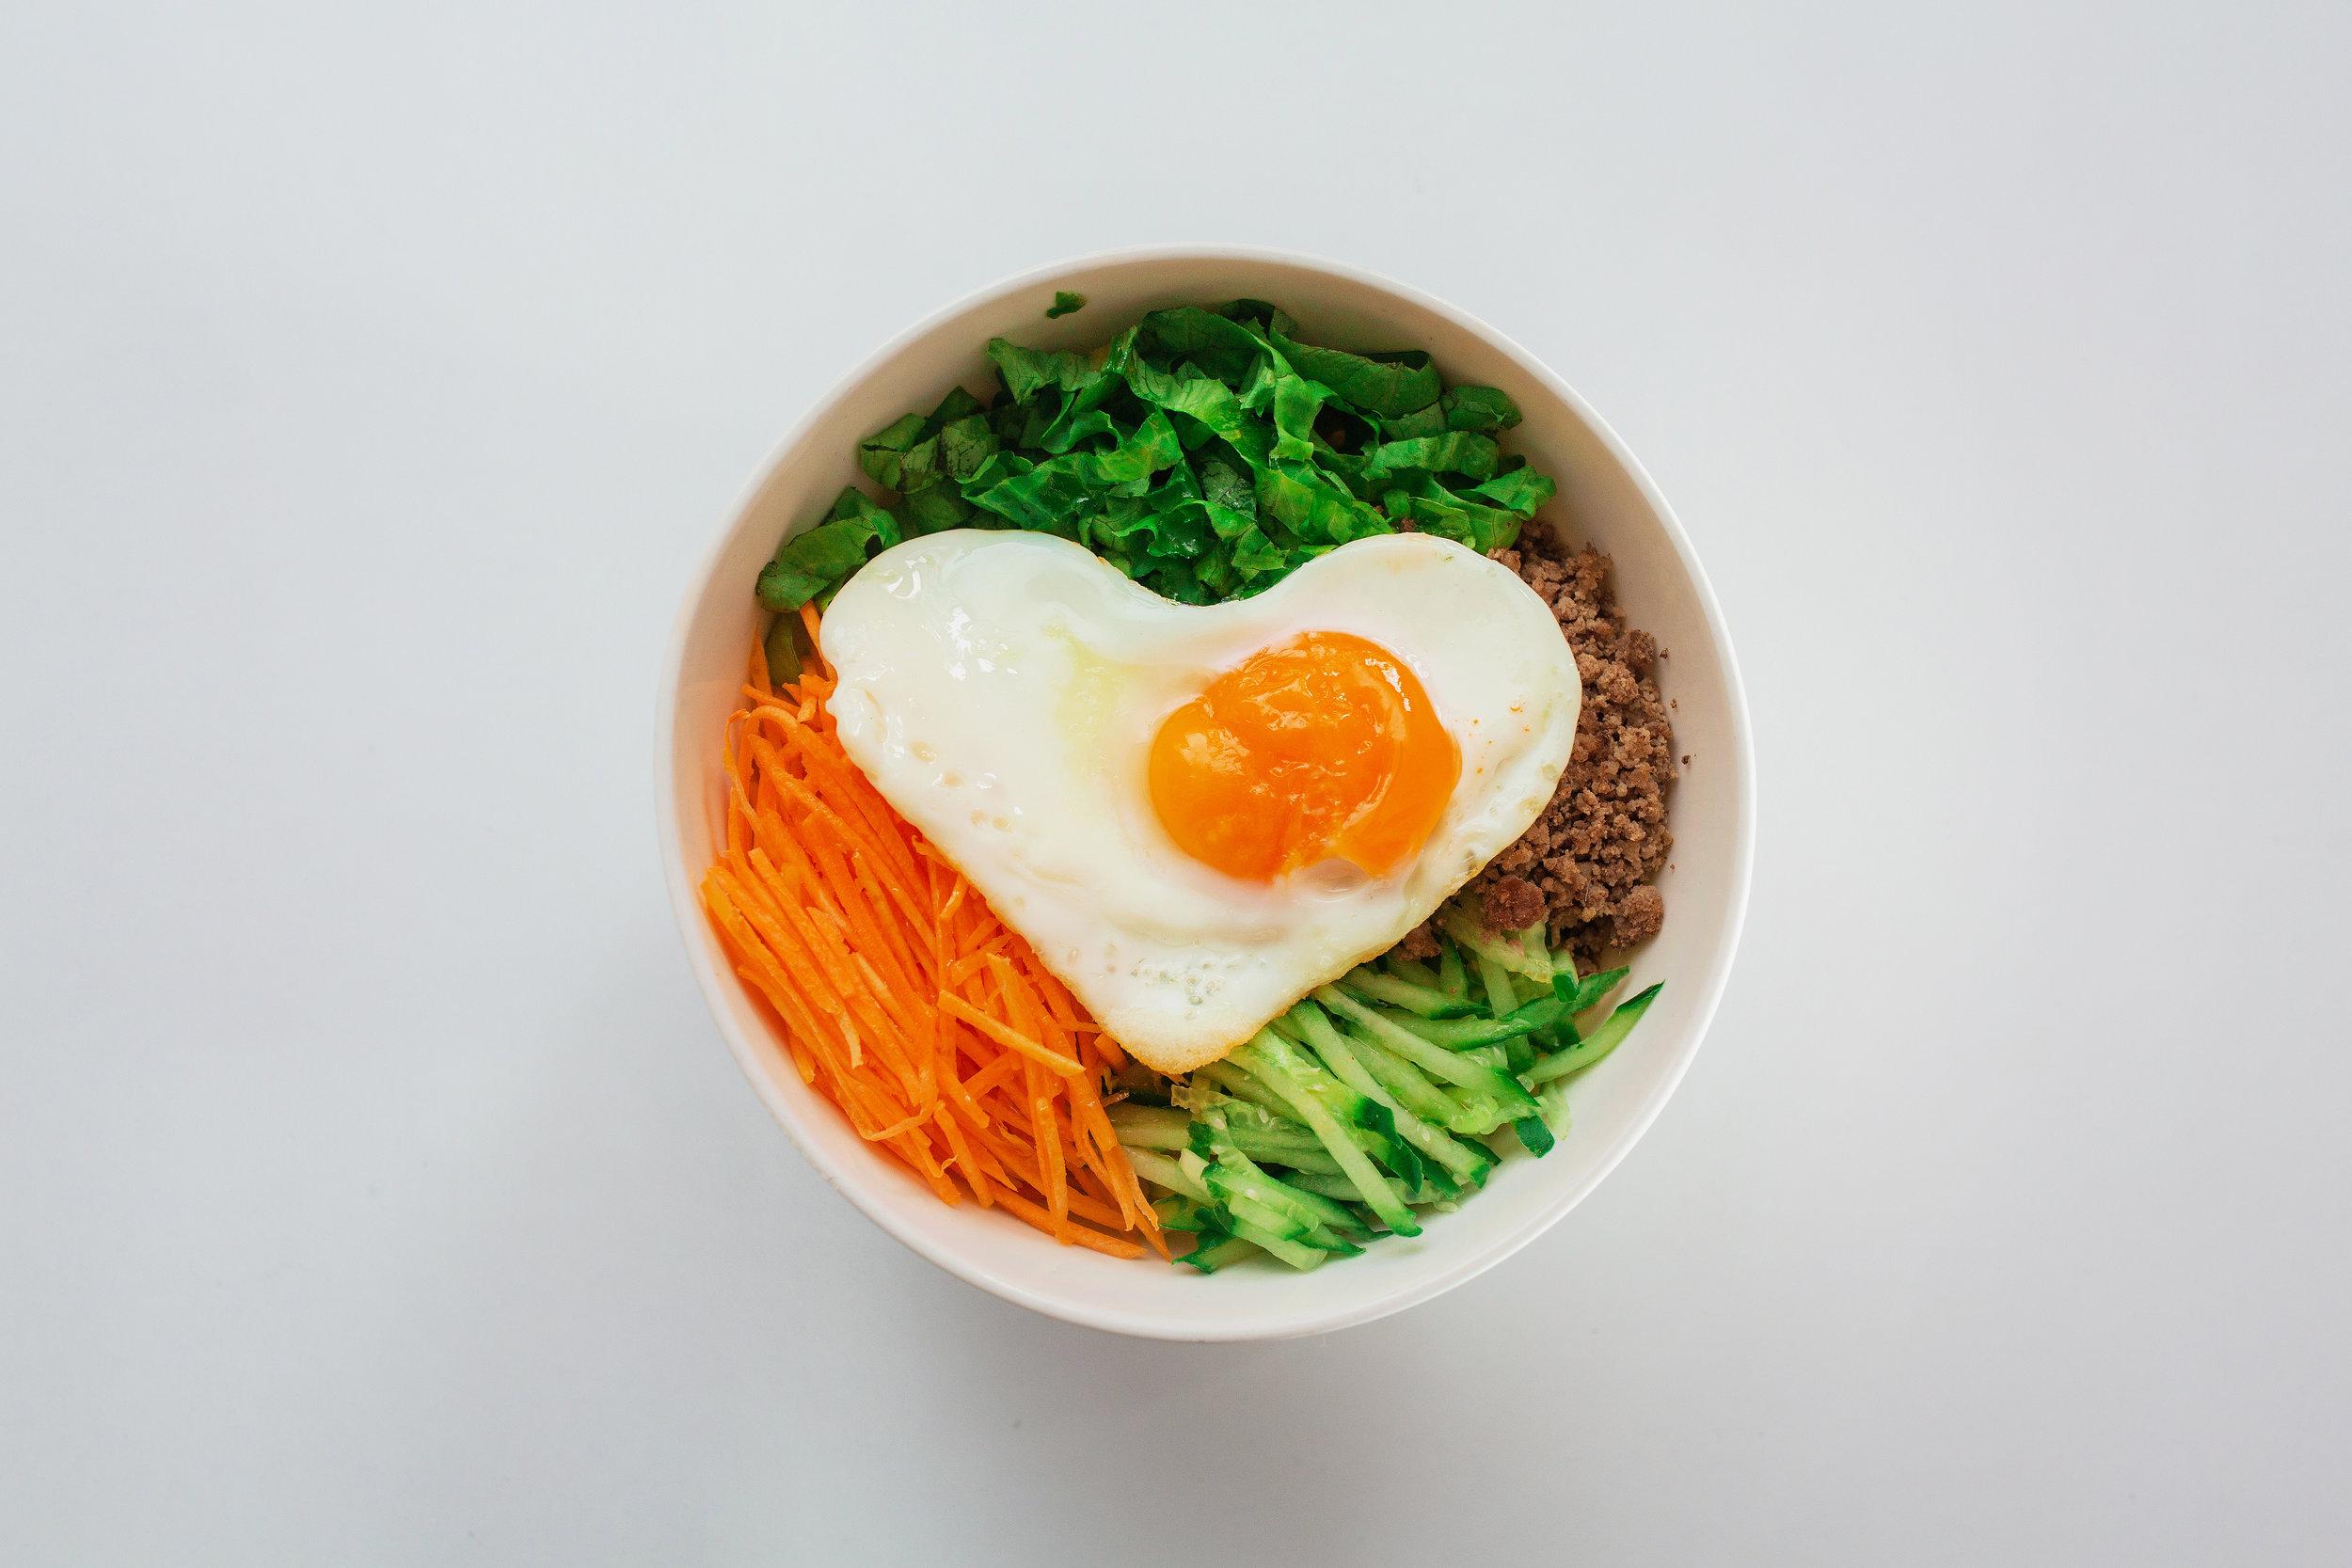 BIBIMBAB* - Beef, lettuce, carrot, cucumber, egg, rice, sesame oil and korean pepper pastesmall / big260kgs / 330kgs230kgs / 290kgs(*vegetarian option)